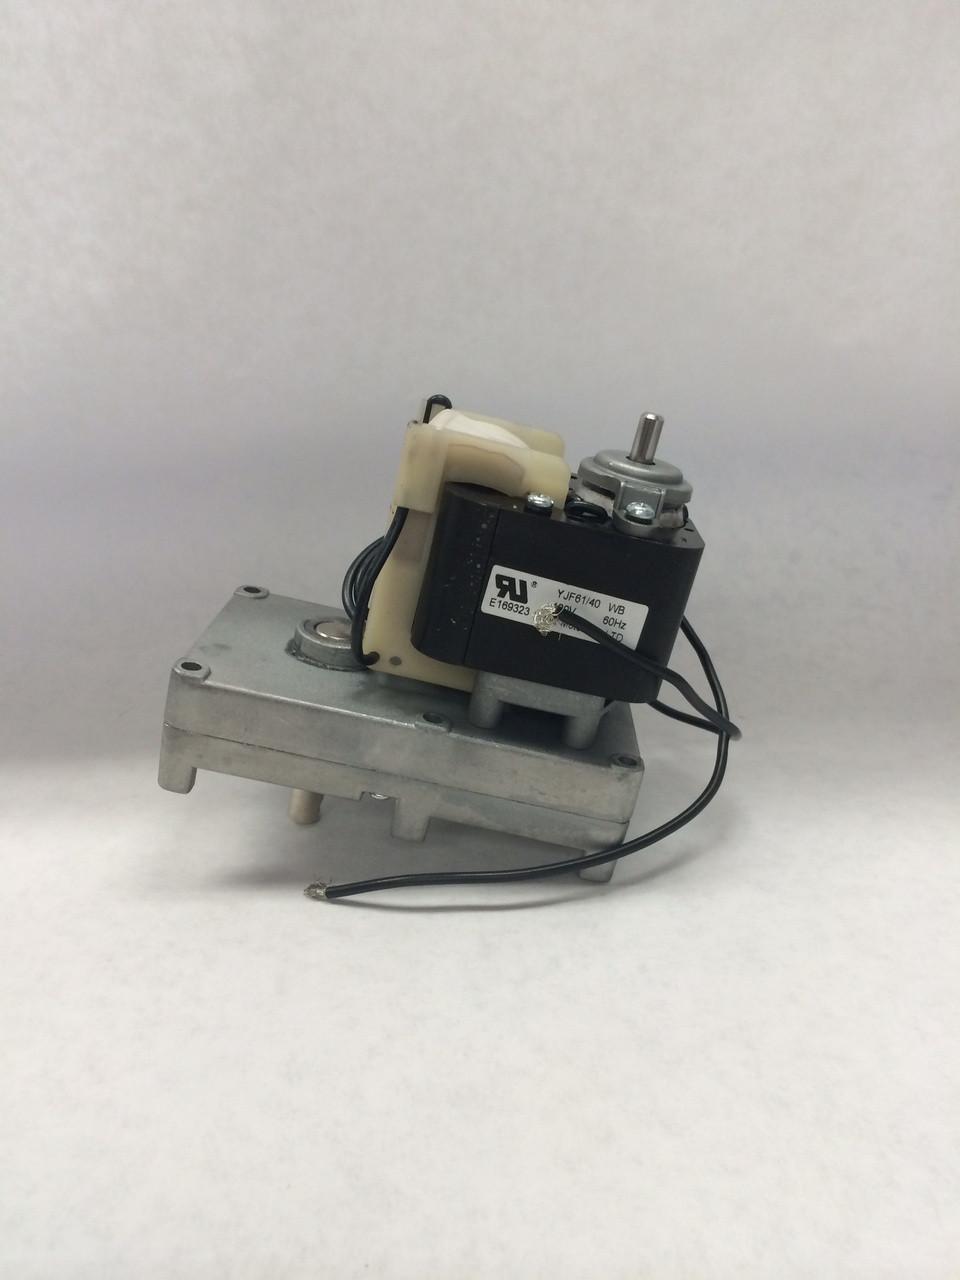 TorRey MV-25 Replacement Gear Motor